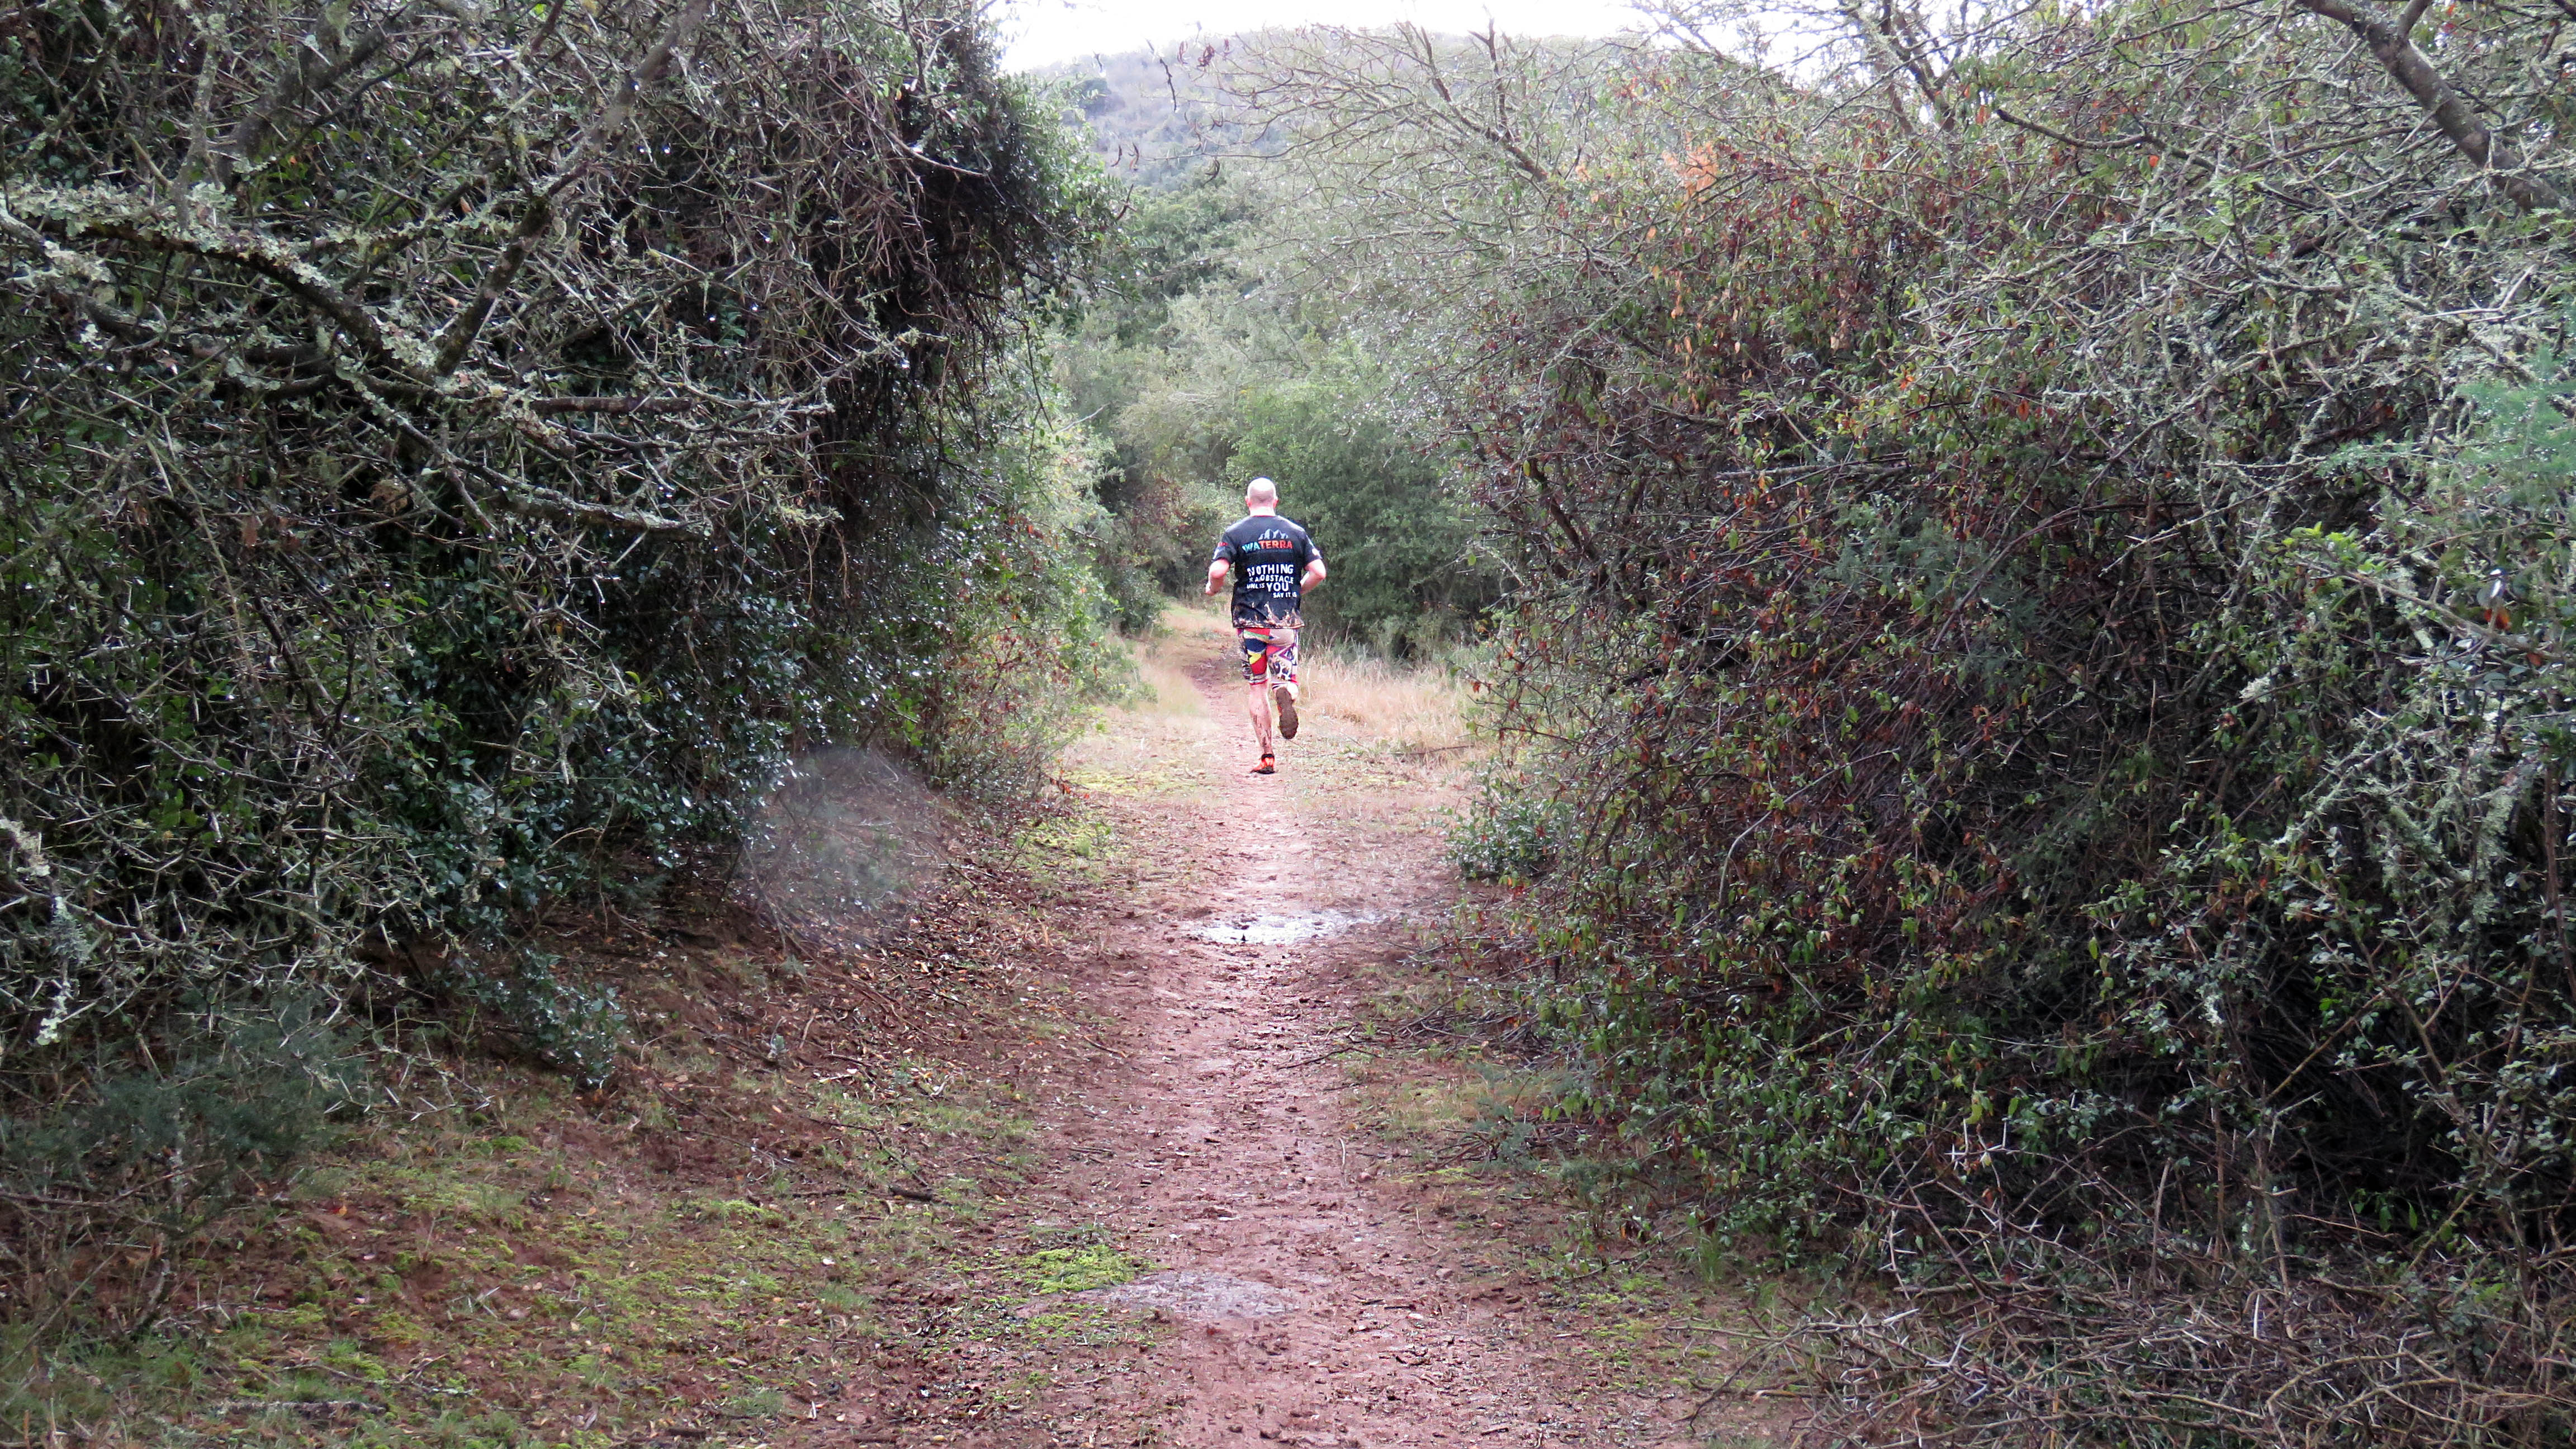 hayterdale trailrun 2018-08-05  (57)